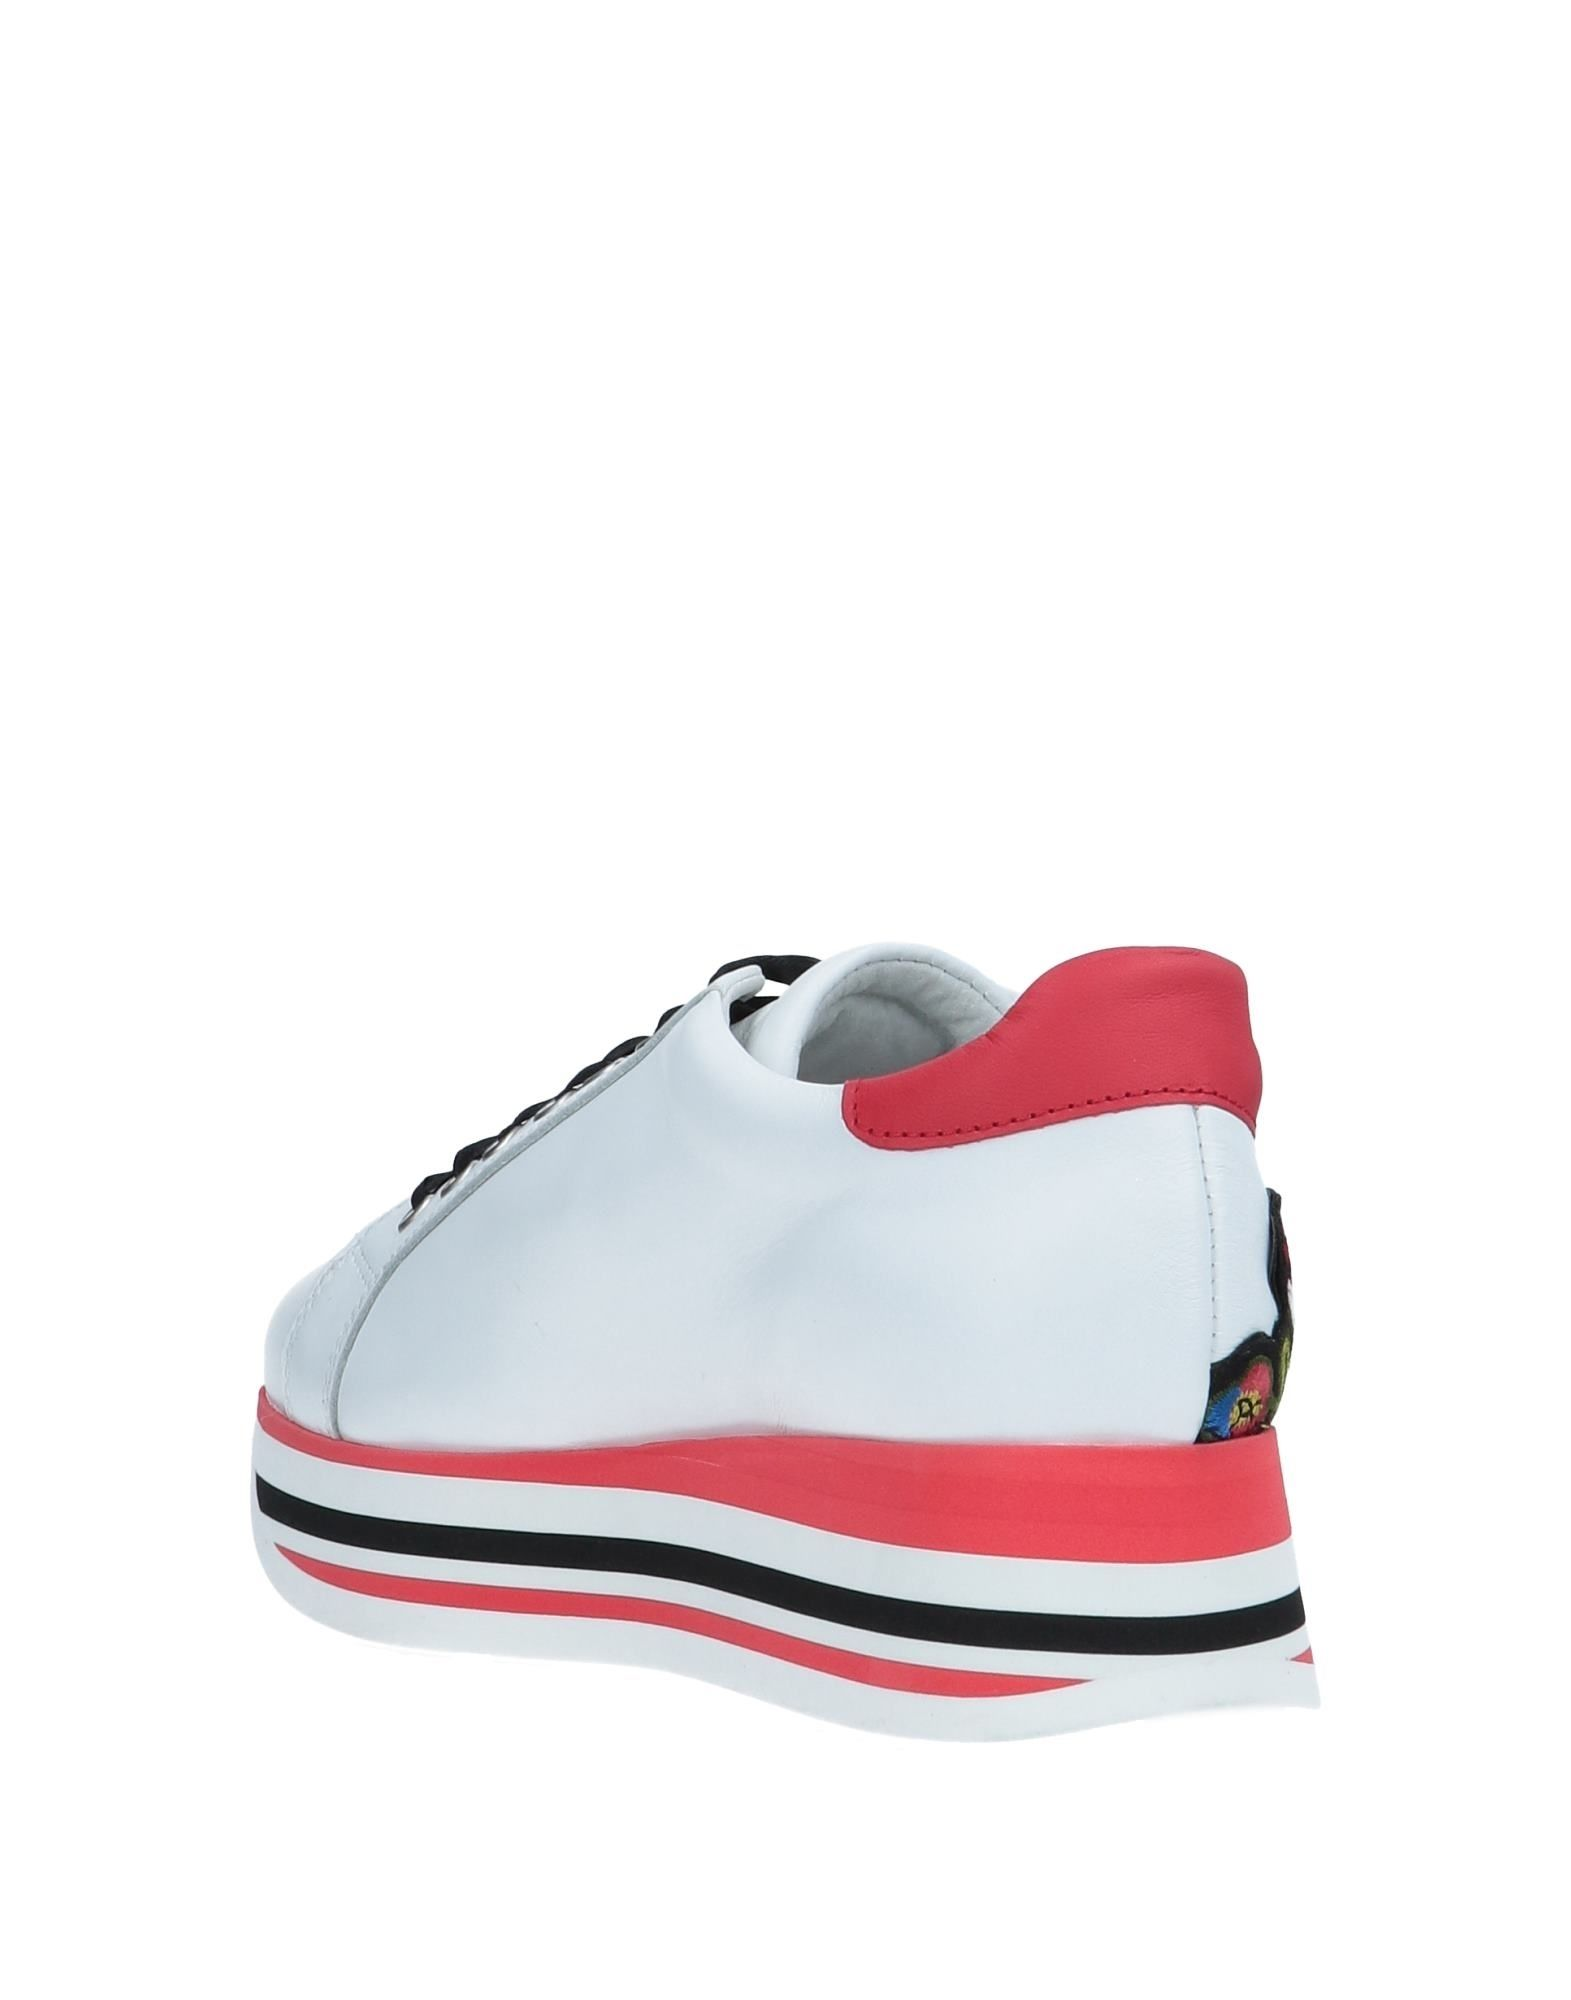 Ovye' By Cristina Lucchi Sneakers Damen  11564825OJ Schuhe Gute Qualität beliebte Schuhe 11564825OJ 8c85d7